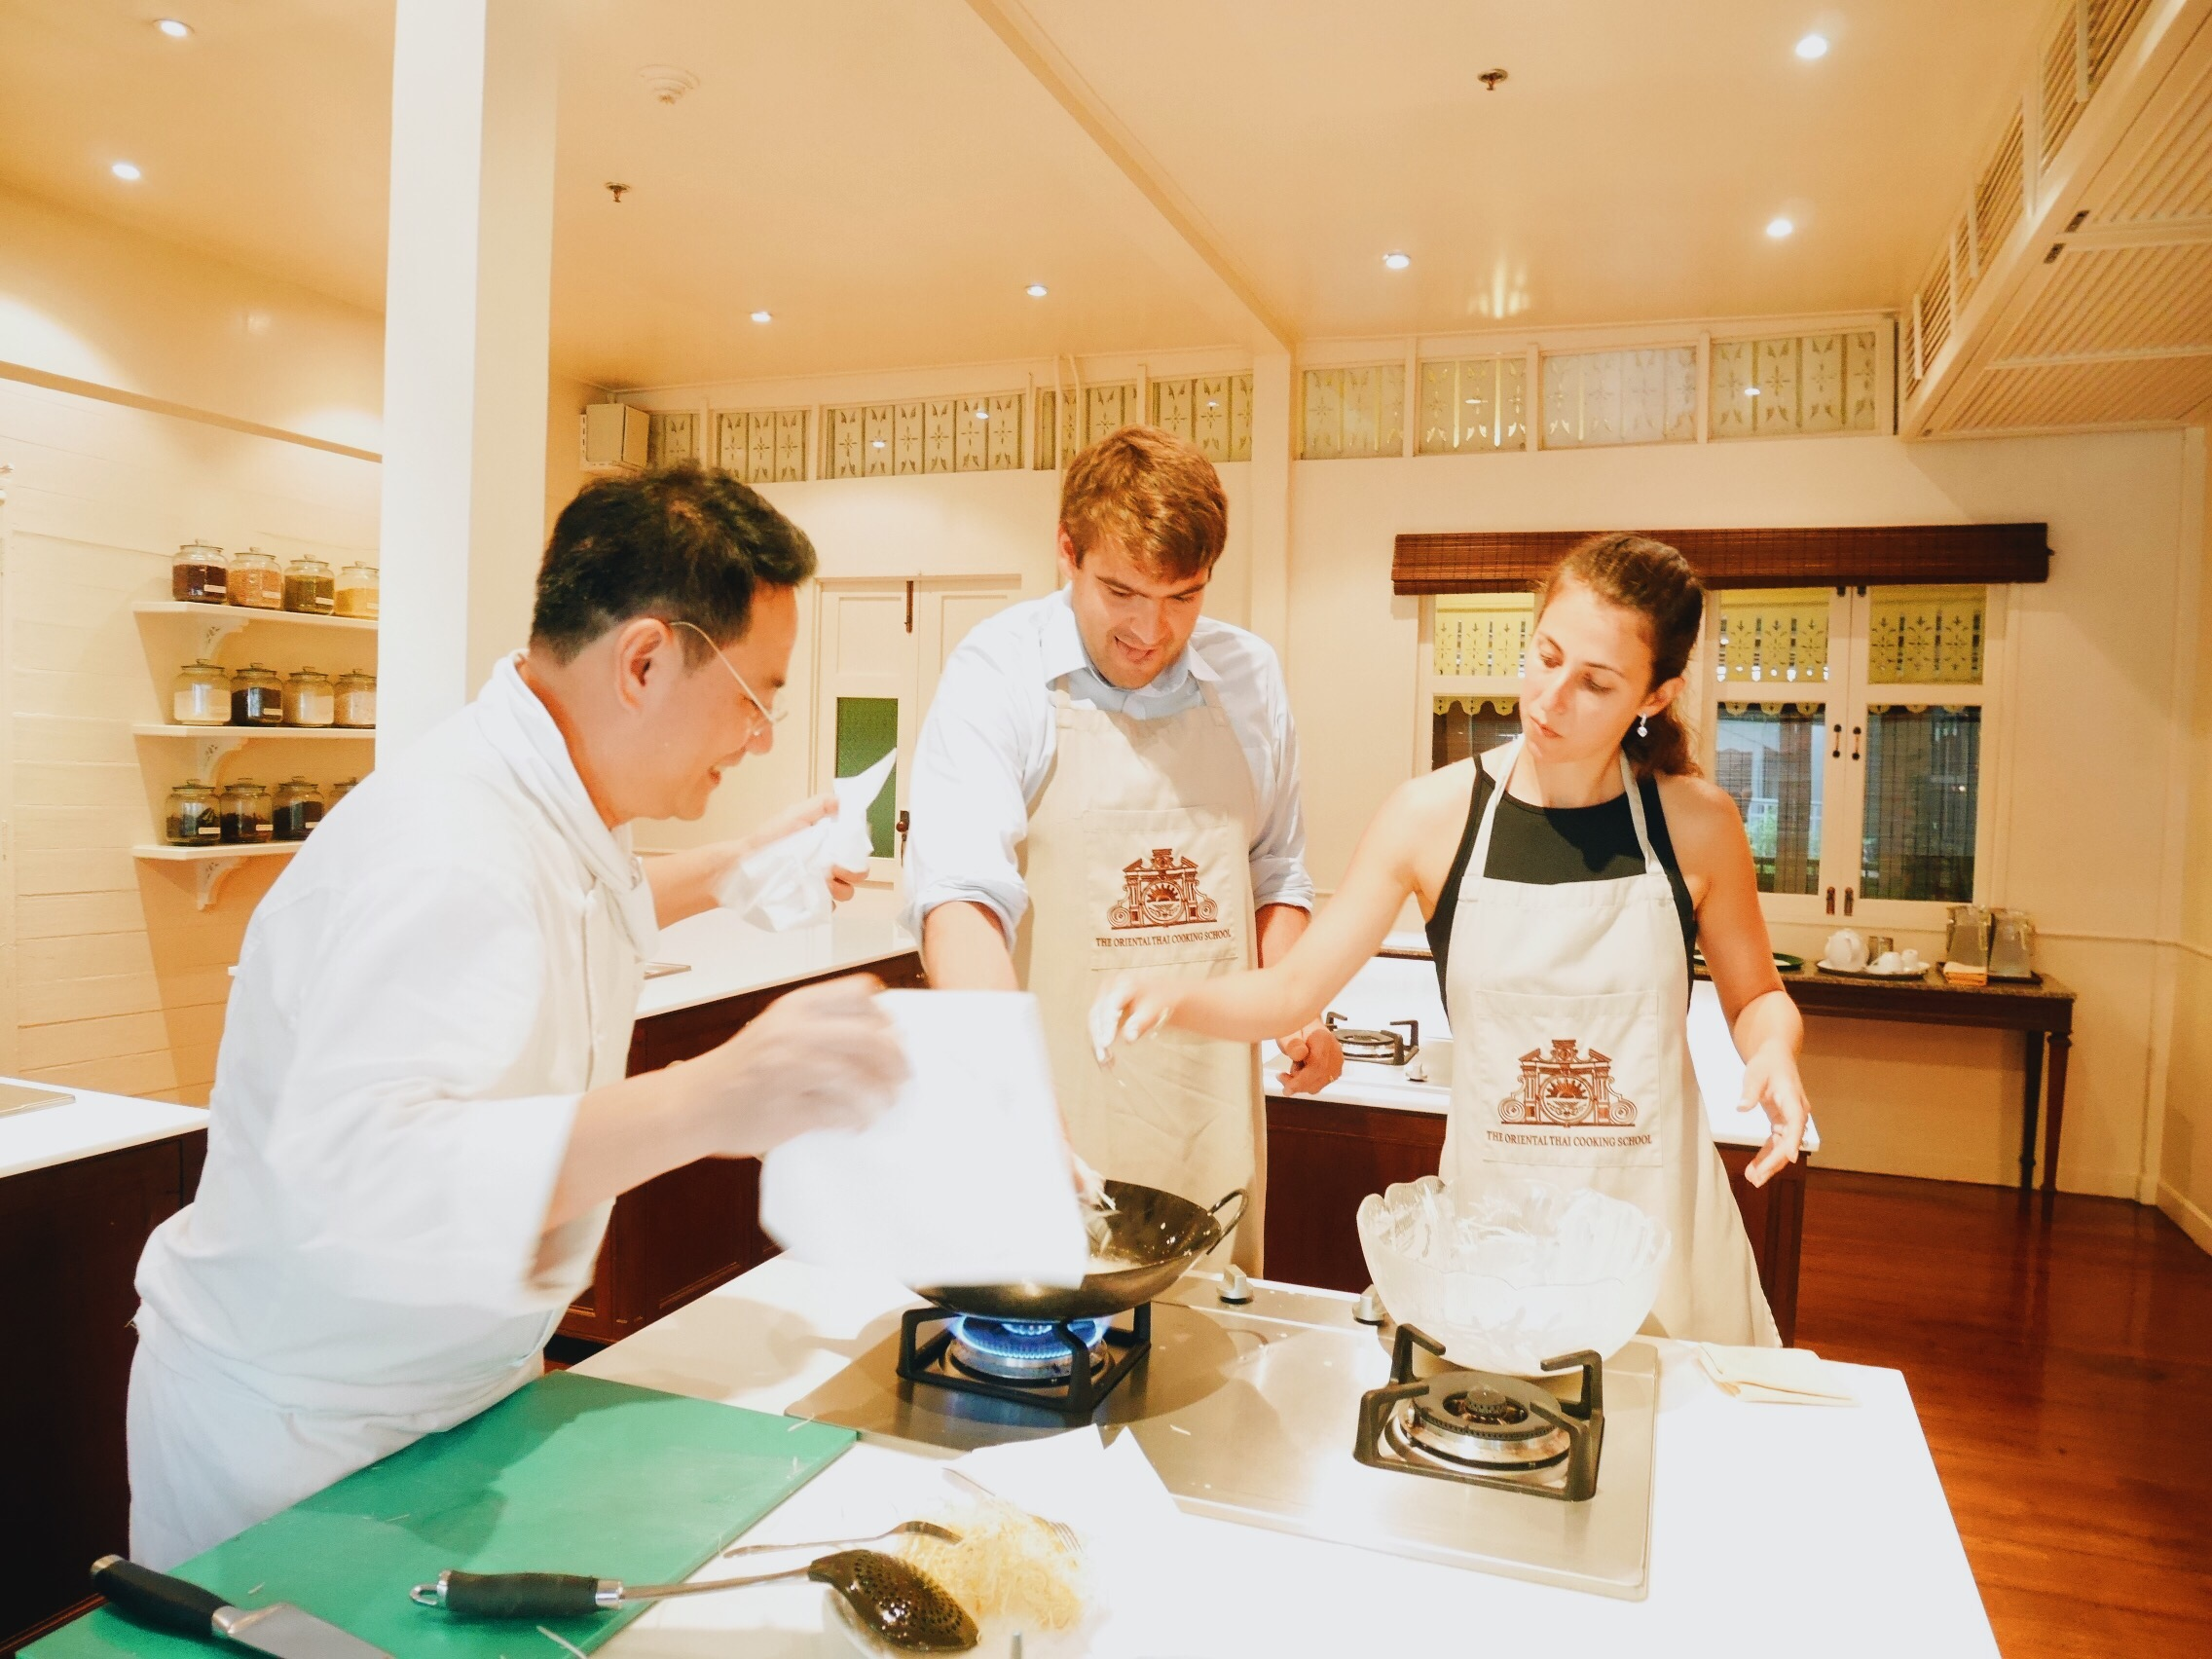 60f5ee56 75cd 4ee5 9add 665ae16f5931 - The Oriental Thai Cooking School - マンダリンオリエンタルバンコクのおもてなし空間で体験する絶品タイ料理教室